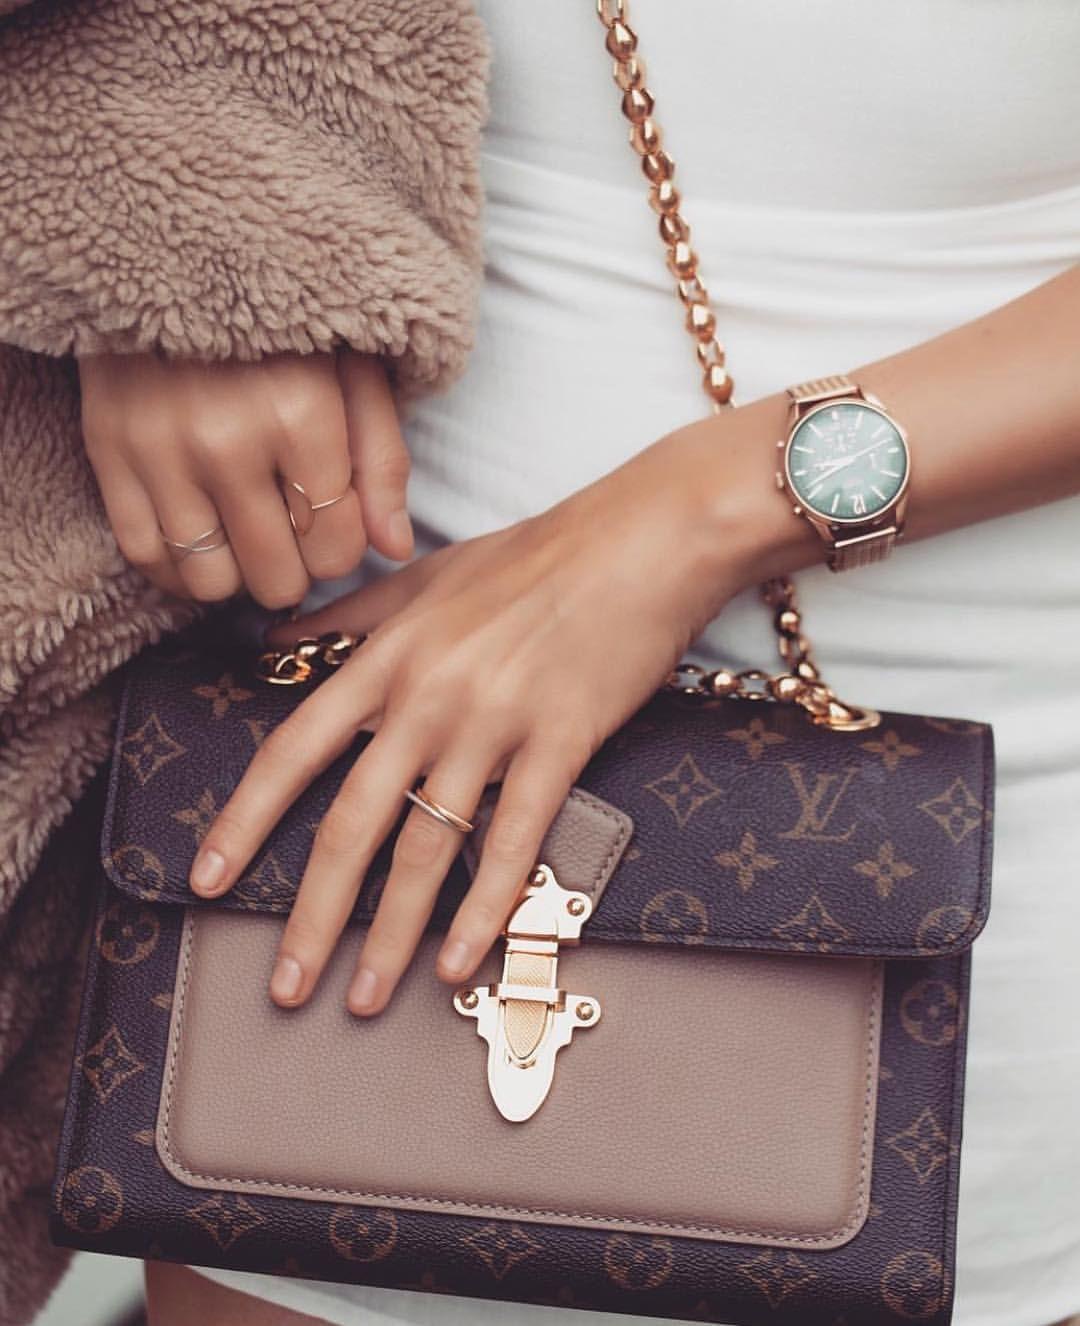 Secrets For Healthy Strong Hair Want More Follow Pinterest Dynashmarie Instagram Dynash Successfu Lv Bag Purses And Handbags Bags Designer